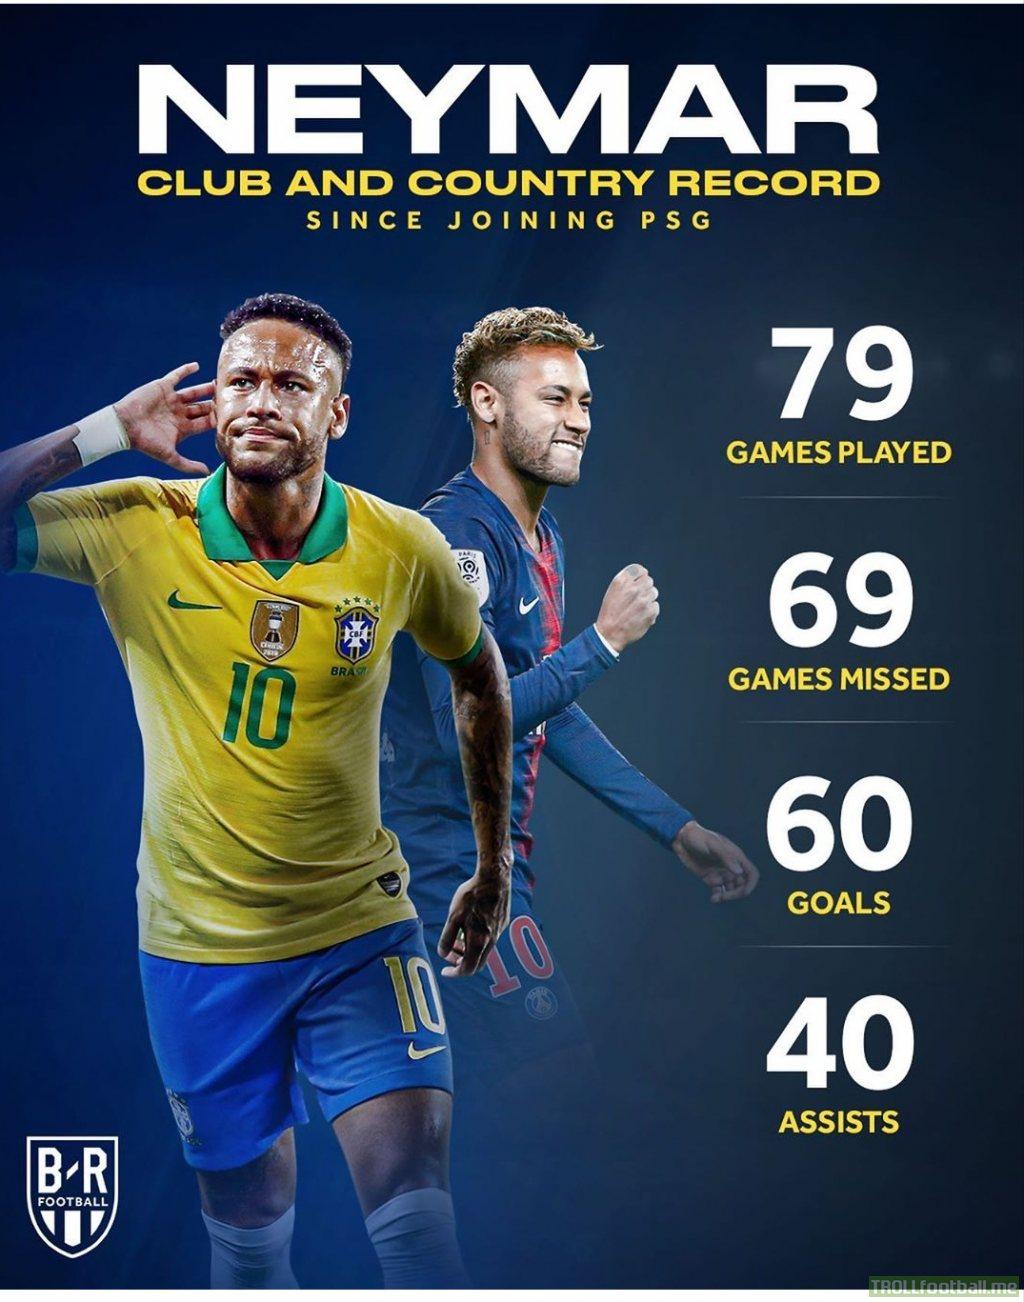 Neymar 's record since joining psg